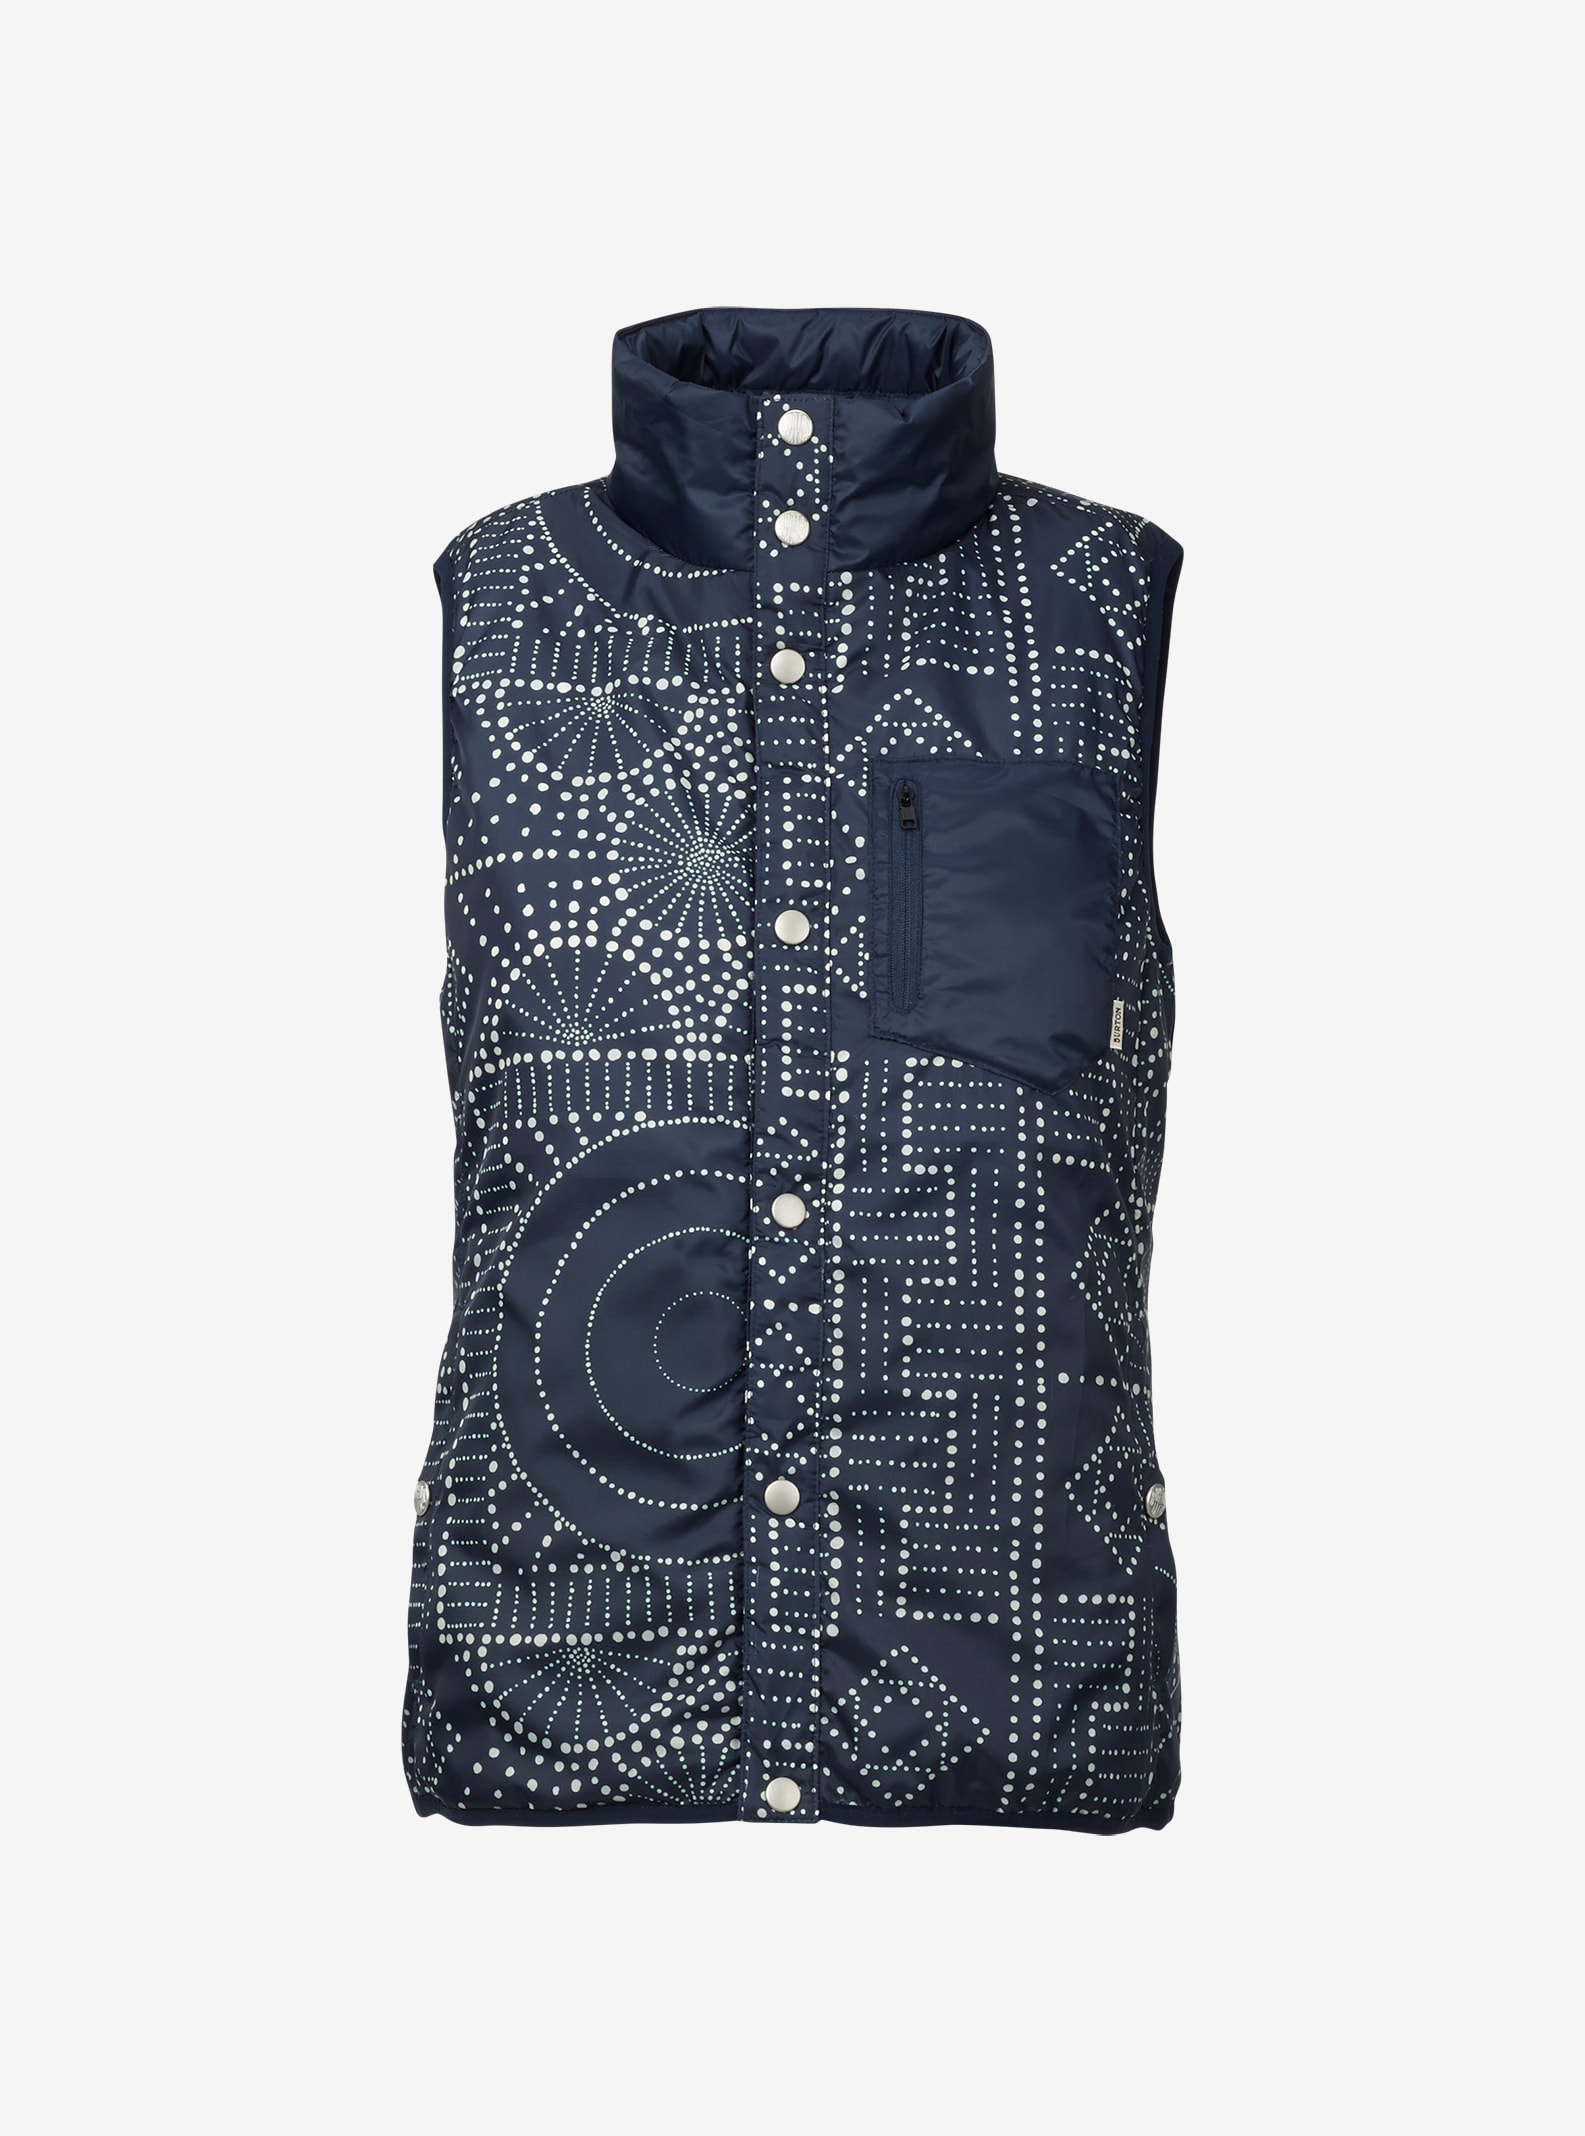 Burton Hella Light Insulator Vest shown in Bandota / Mood Indigo